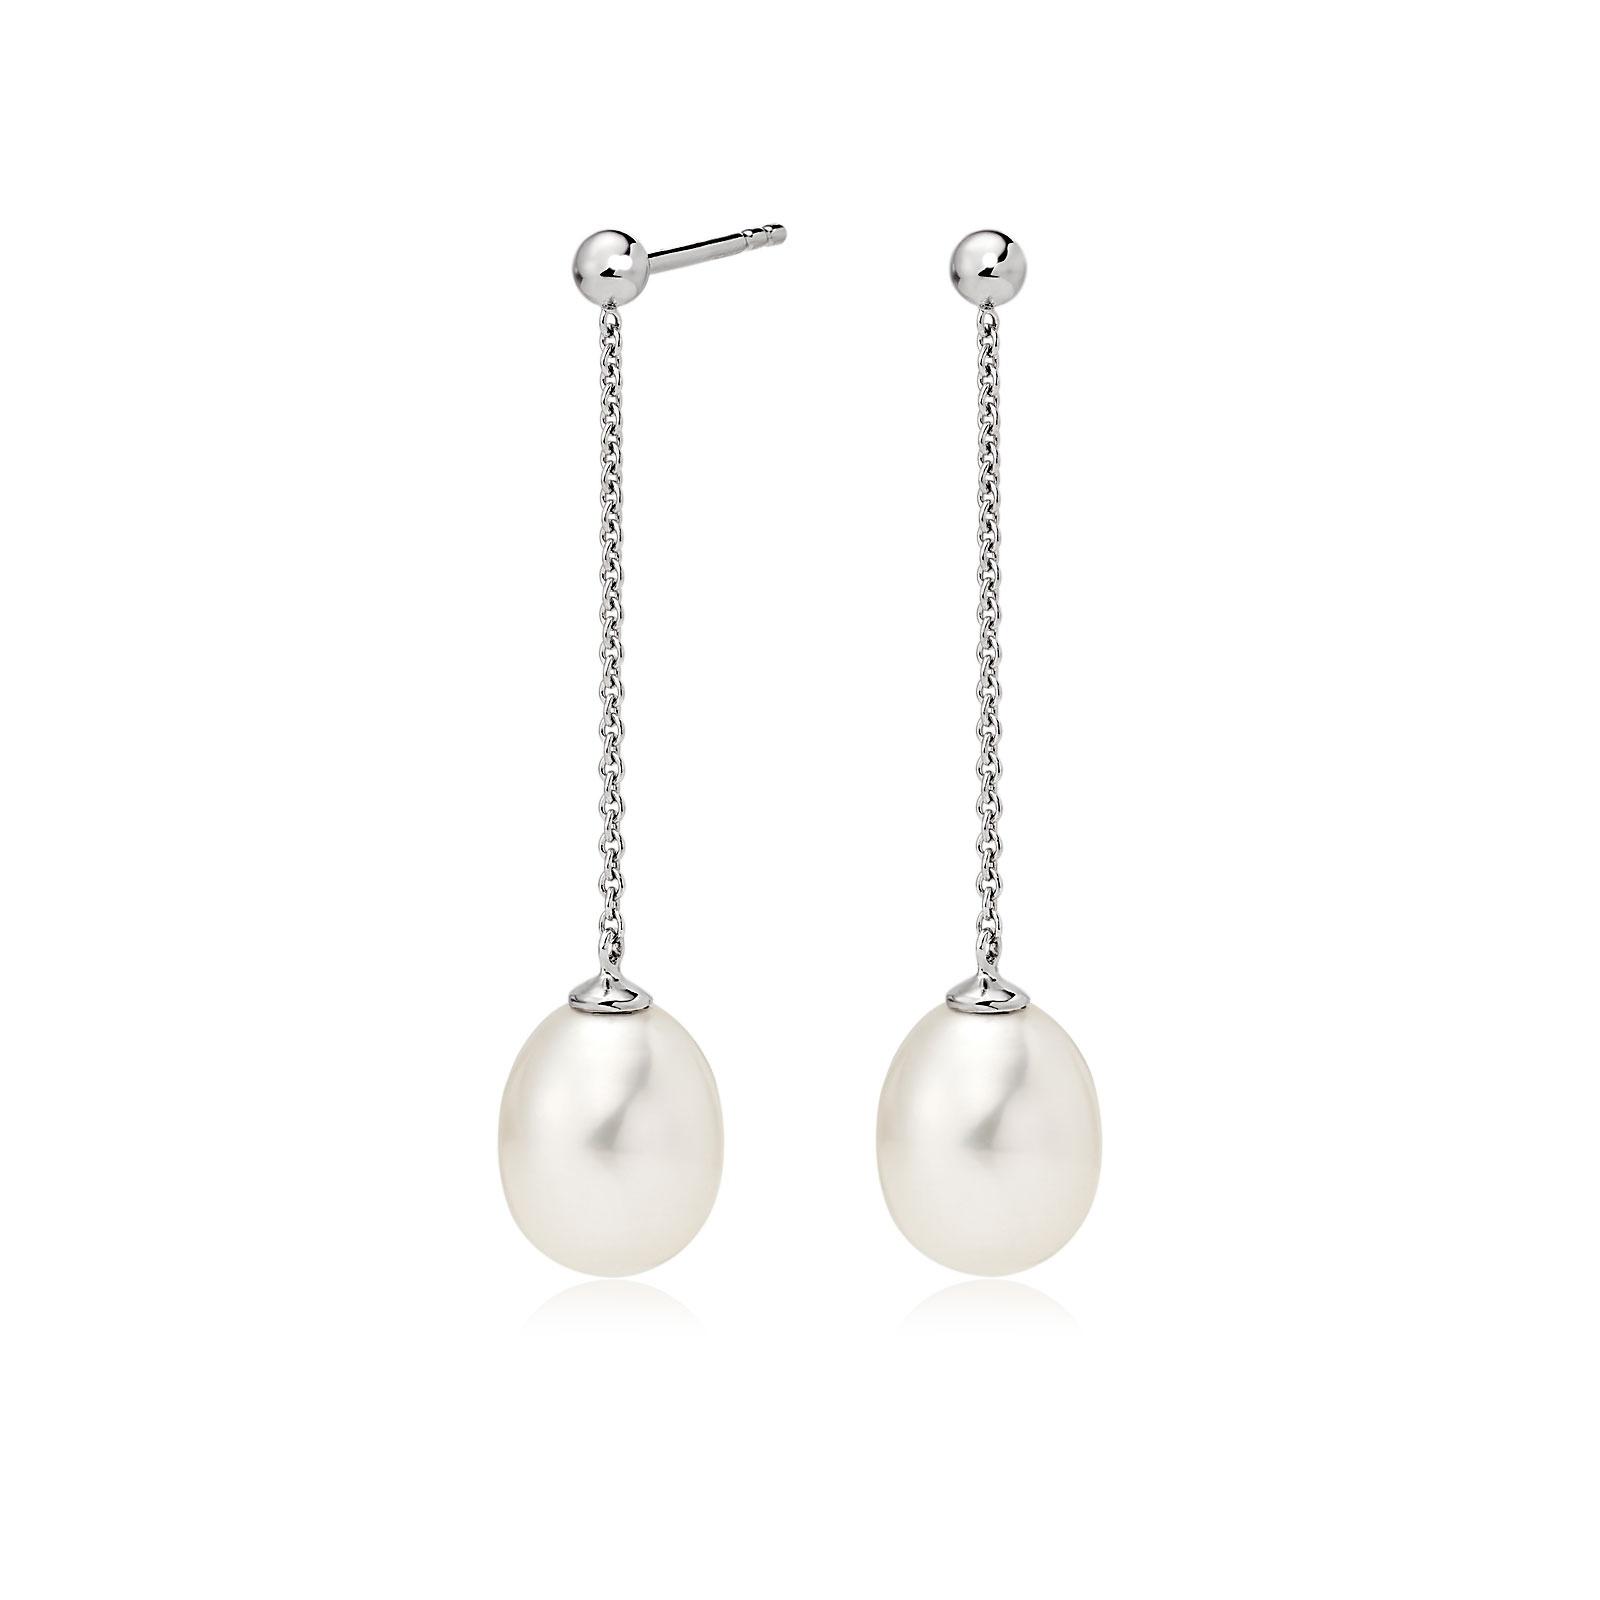 Freshwater Pearl Constellation Earrings in White Gold-FEWDWG1223-1